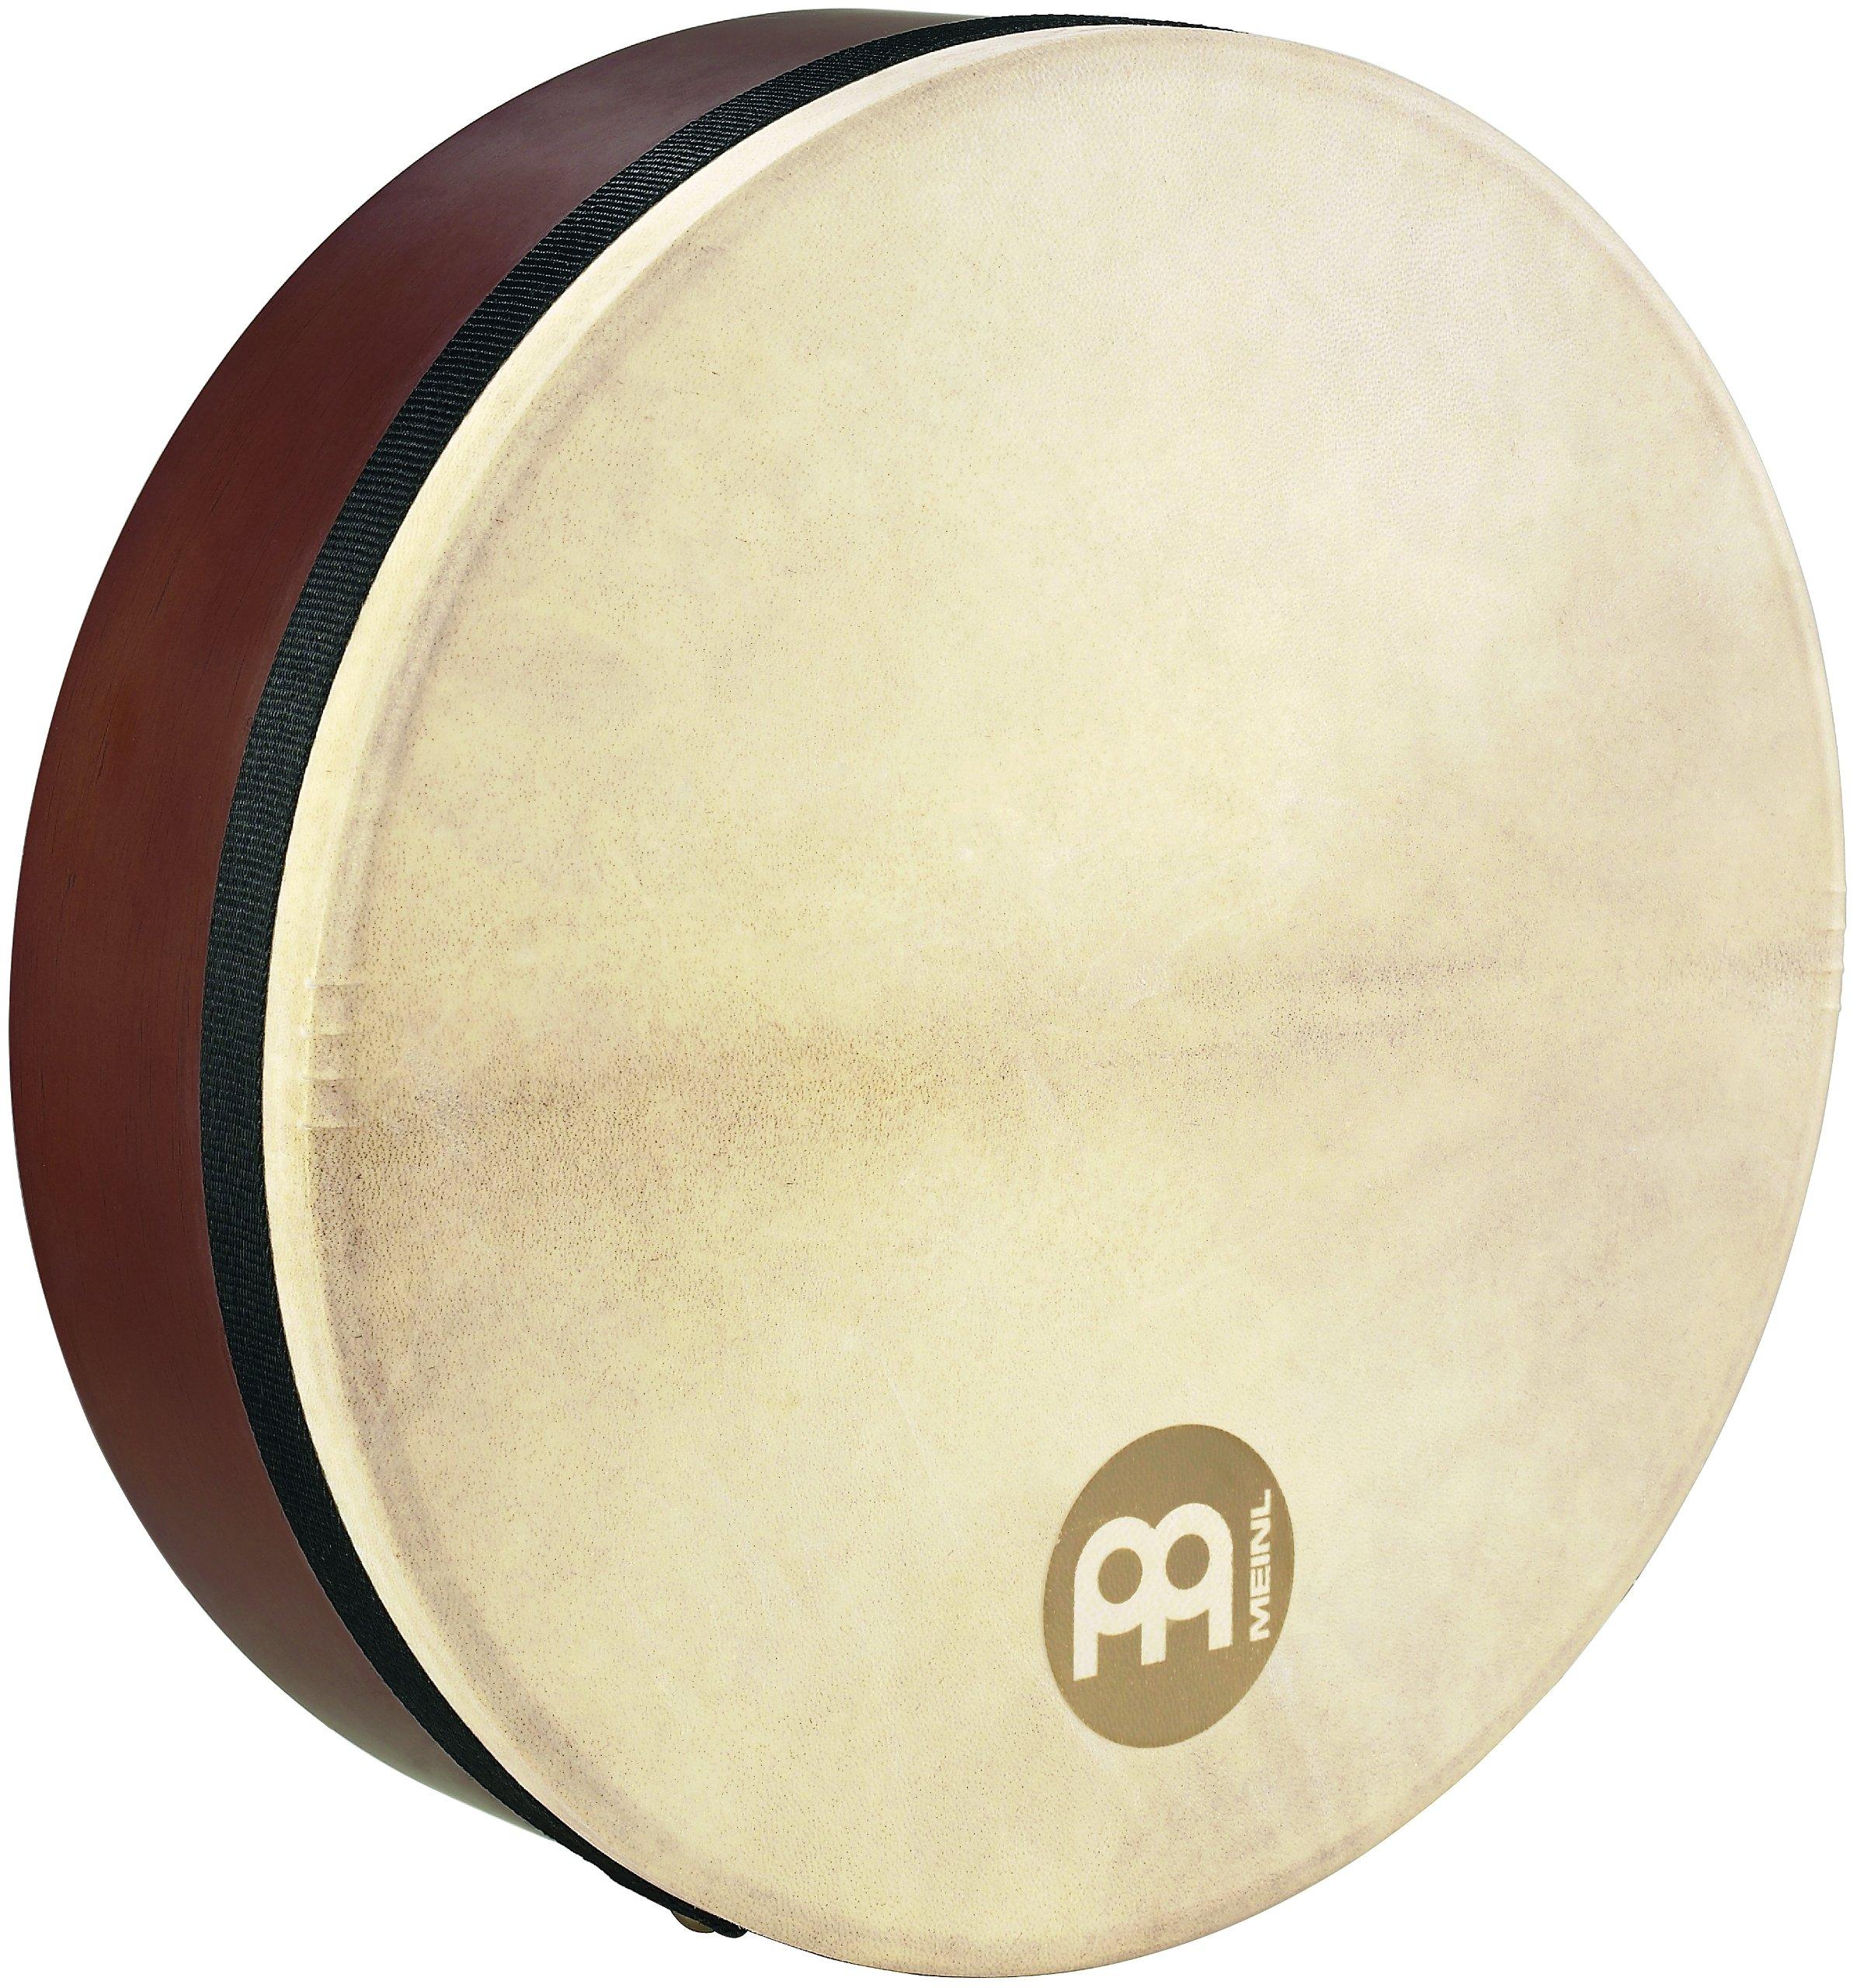 Meinl Percussion FD14BE 14-Inch Goat Skin Bendir, African Brown